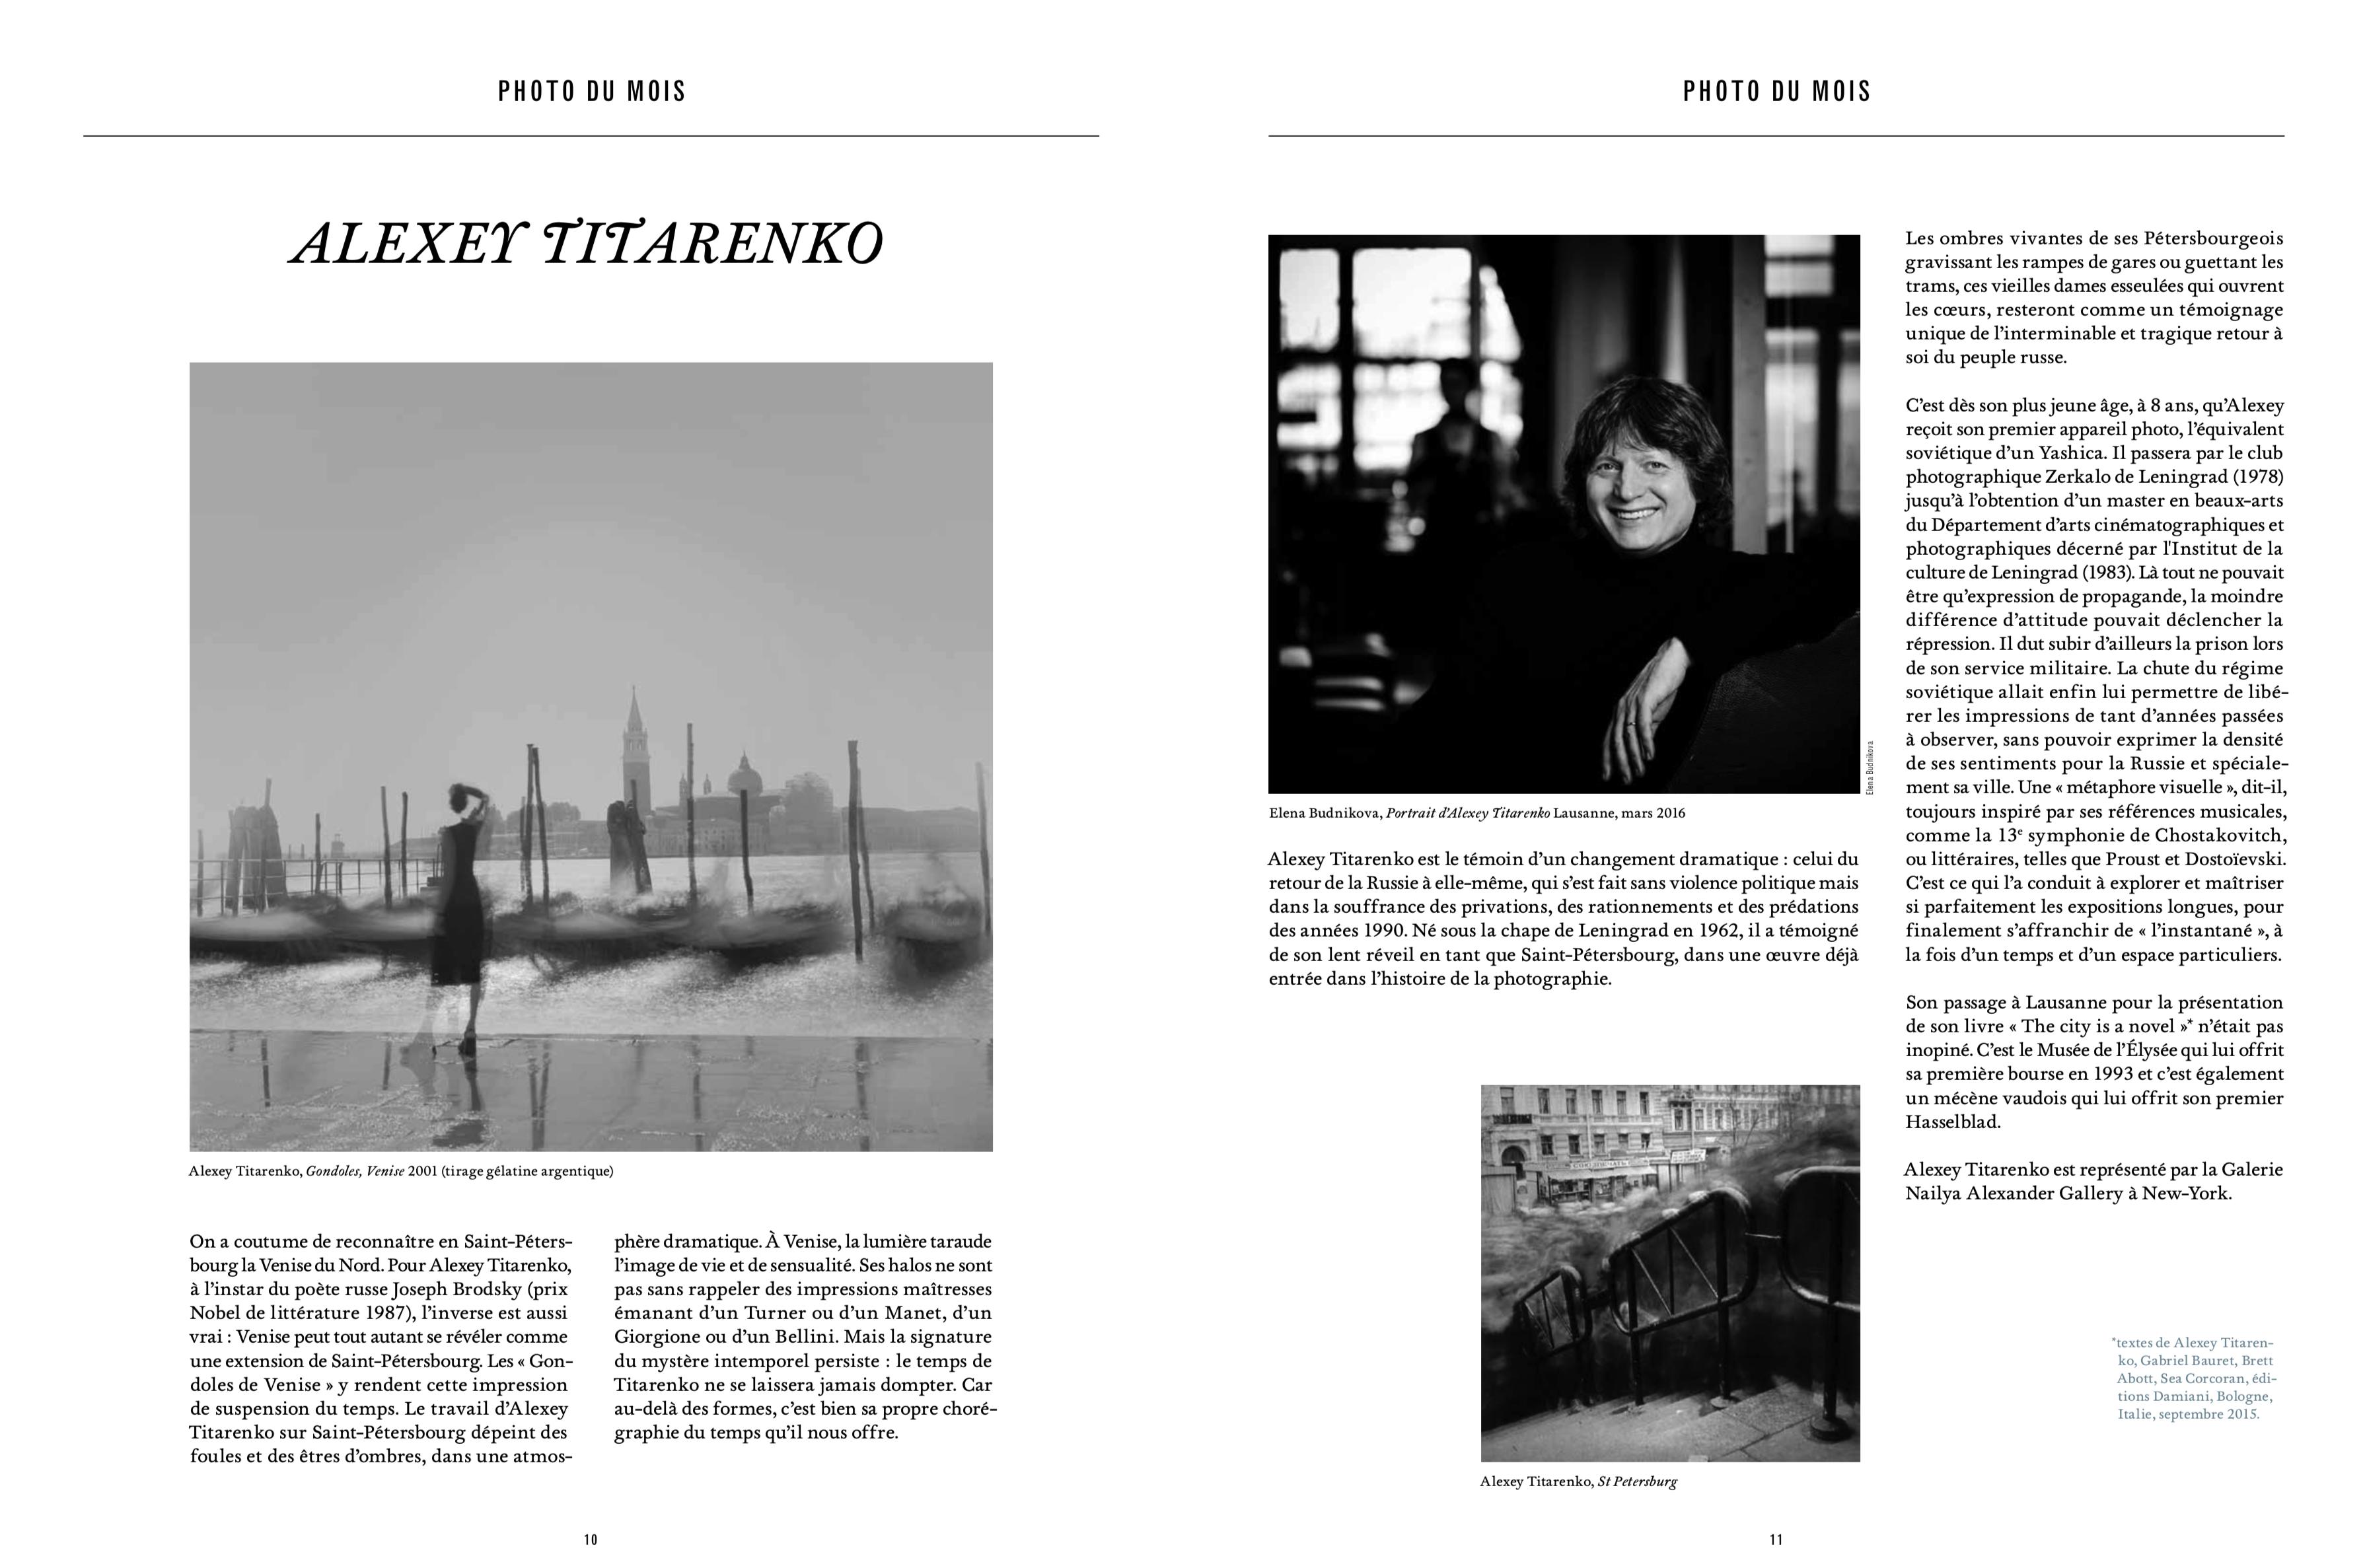 Magazine Market № 129, Geneva. Interview and portrait of Alexey Titarenko